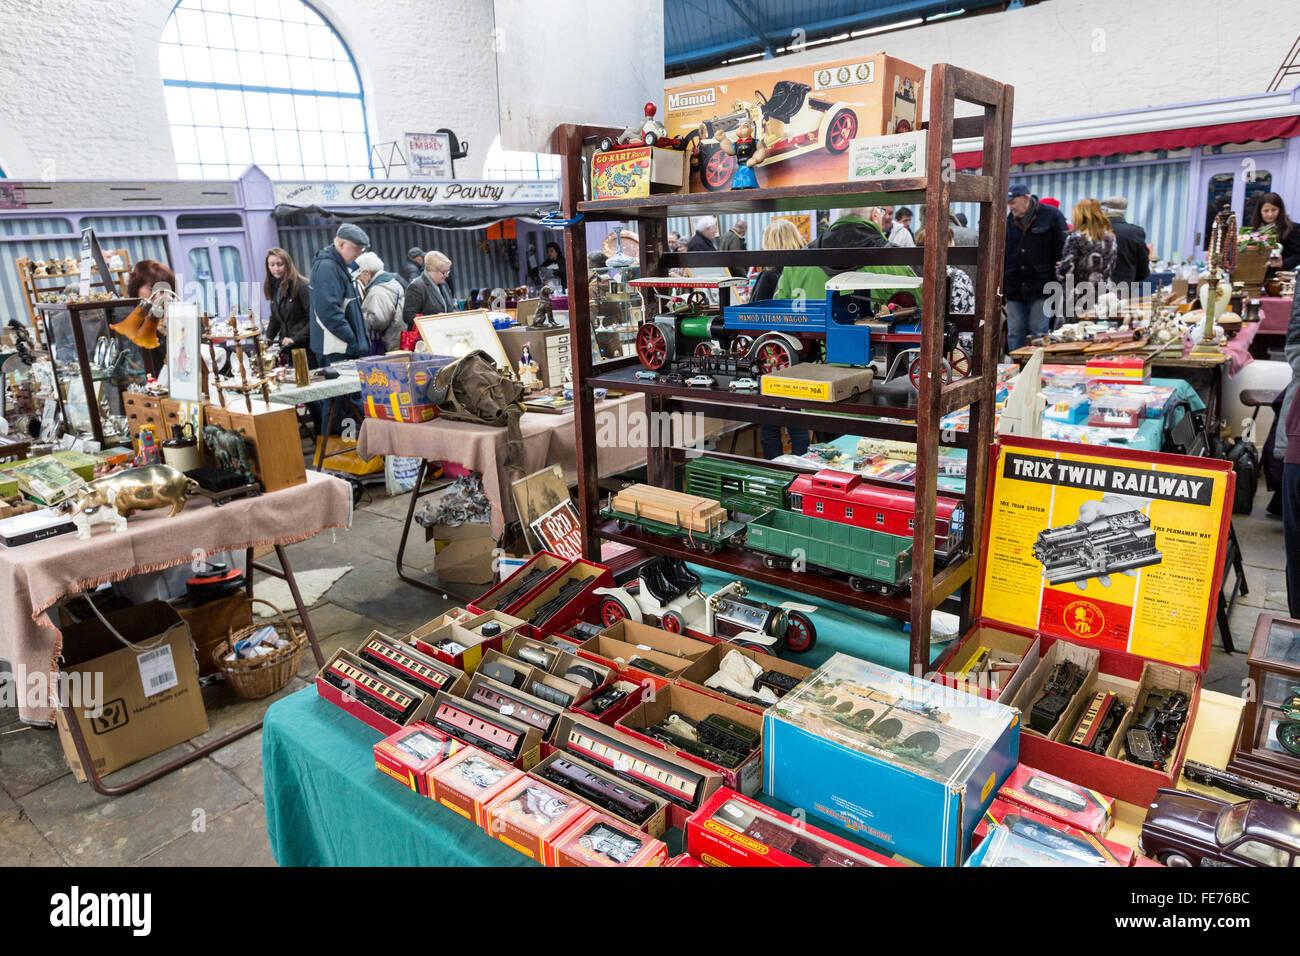 Indoor antique flea market with toy trains on sale, Abergavenny, Wales, UK - Stock Image